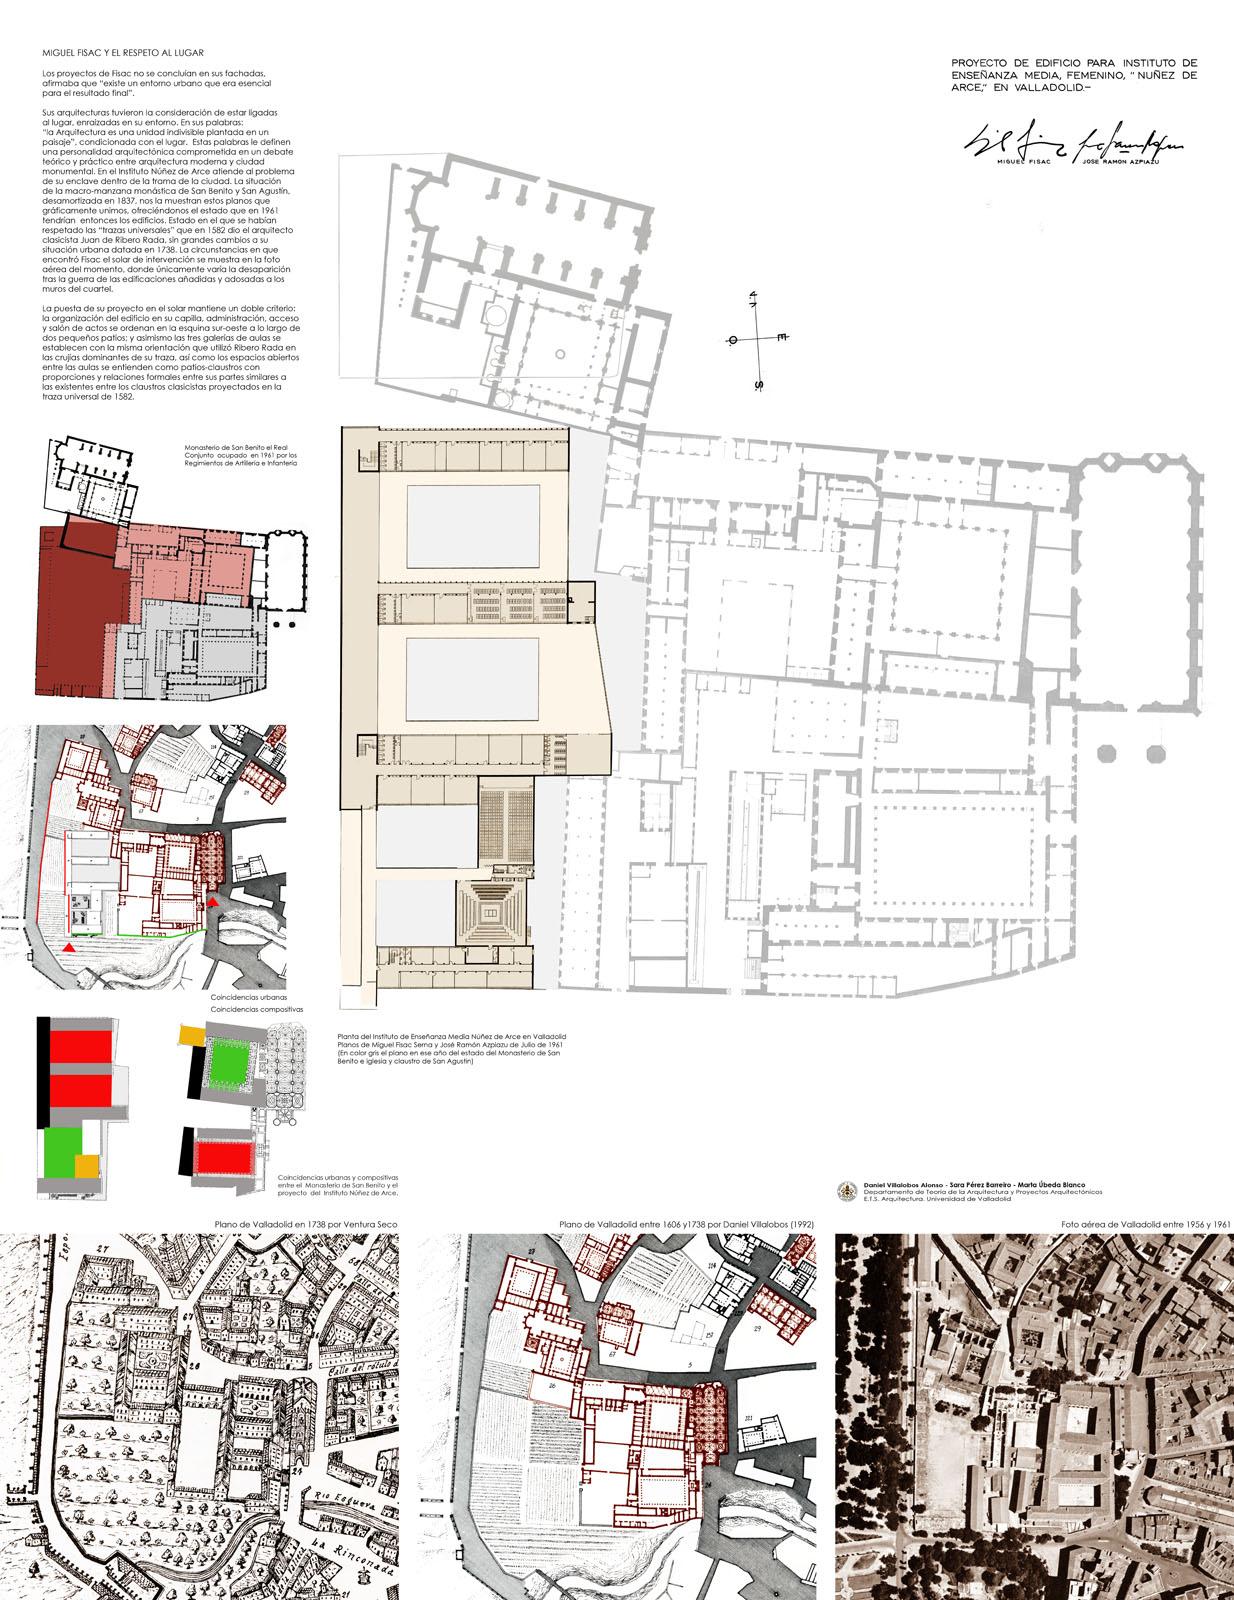 danielvillalobos-huesosfisac-miguelfisac-modernarchitecture-12